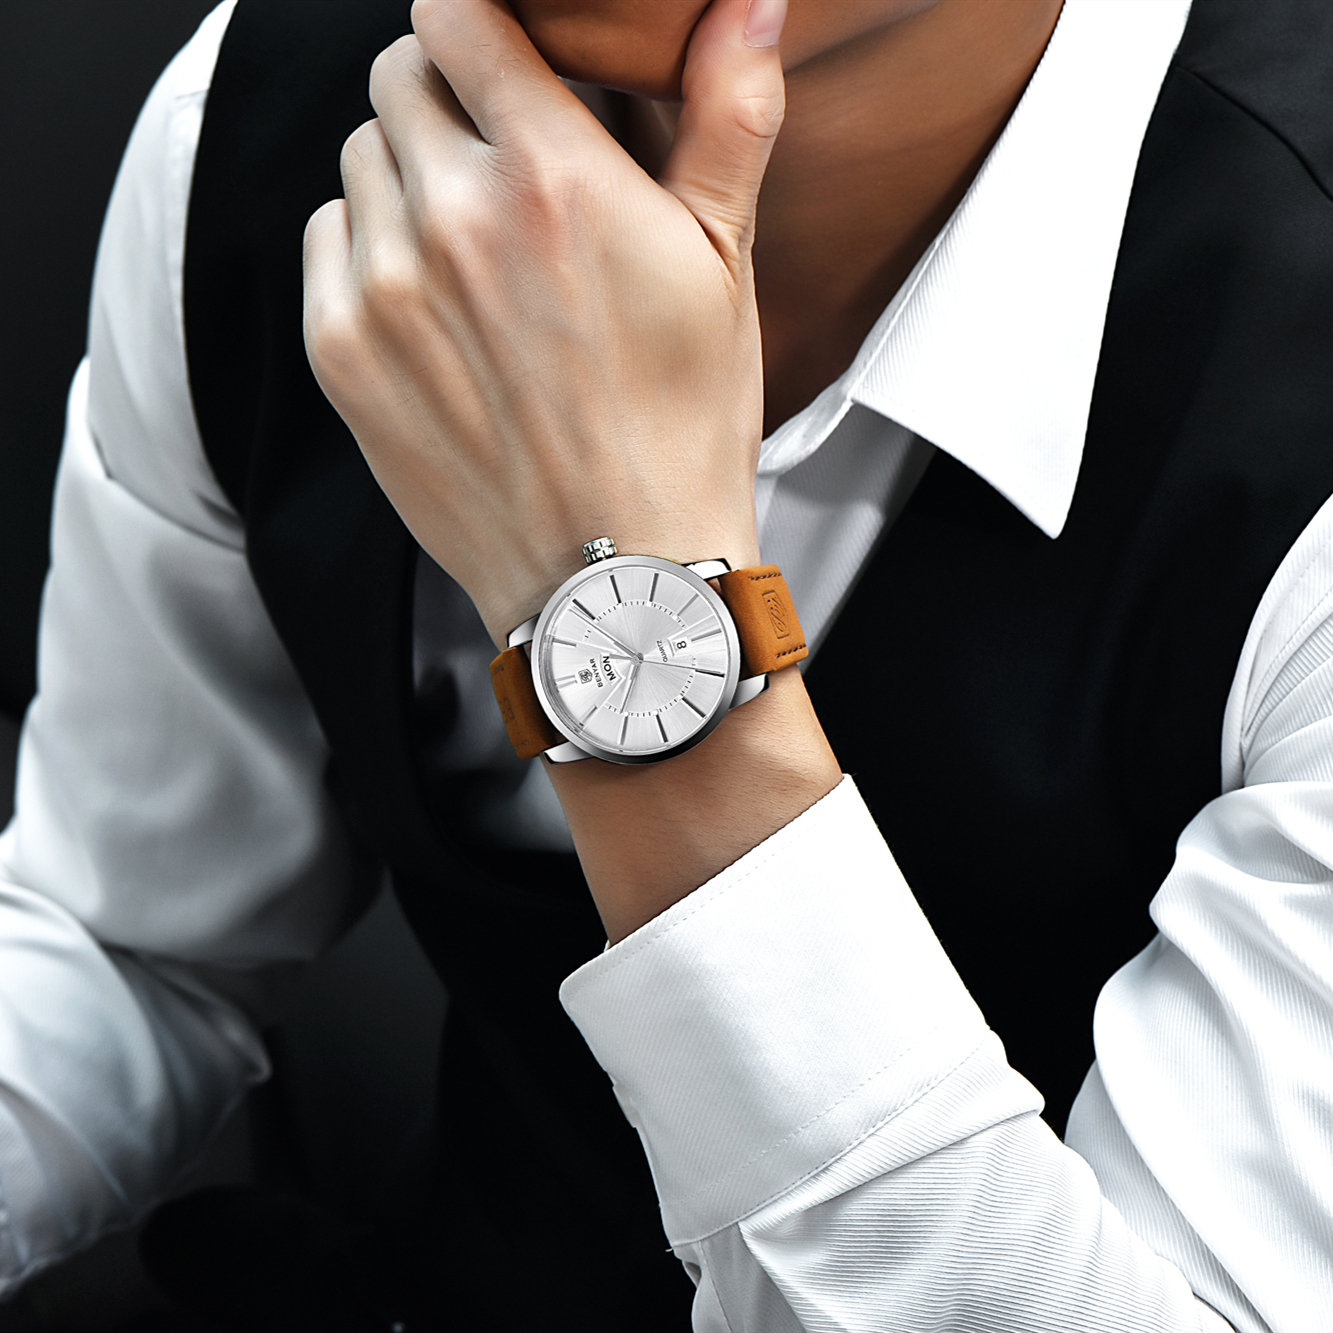 Image 4 - Relogio Masculino BENYAR Luxury Brand  Analog Display Date Mens Quartz Watch 30M Waterproof Genuine Leather Strap Casual Watchclock ipodwatch reportclock rugby -